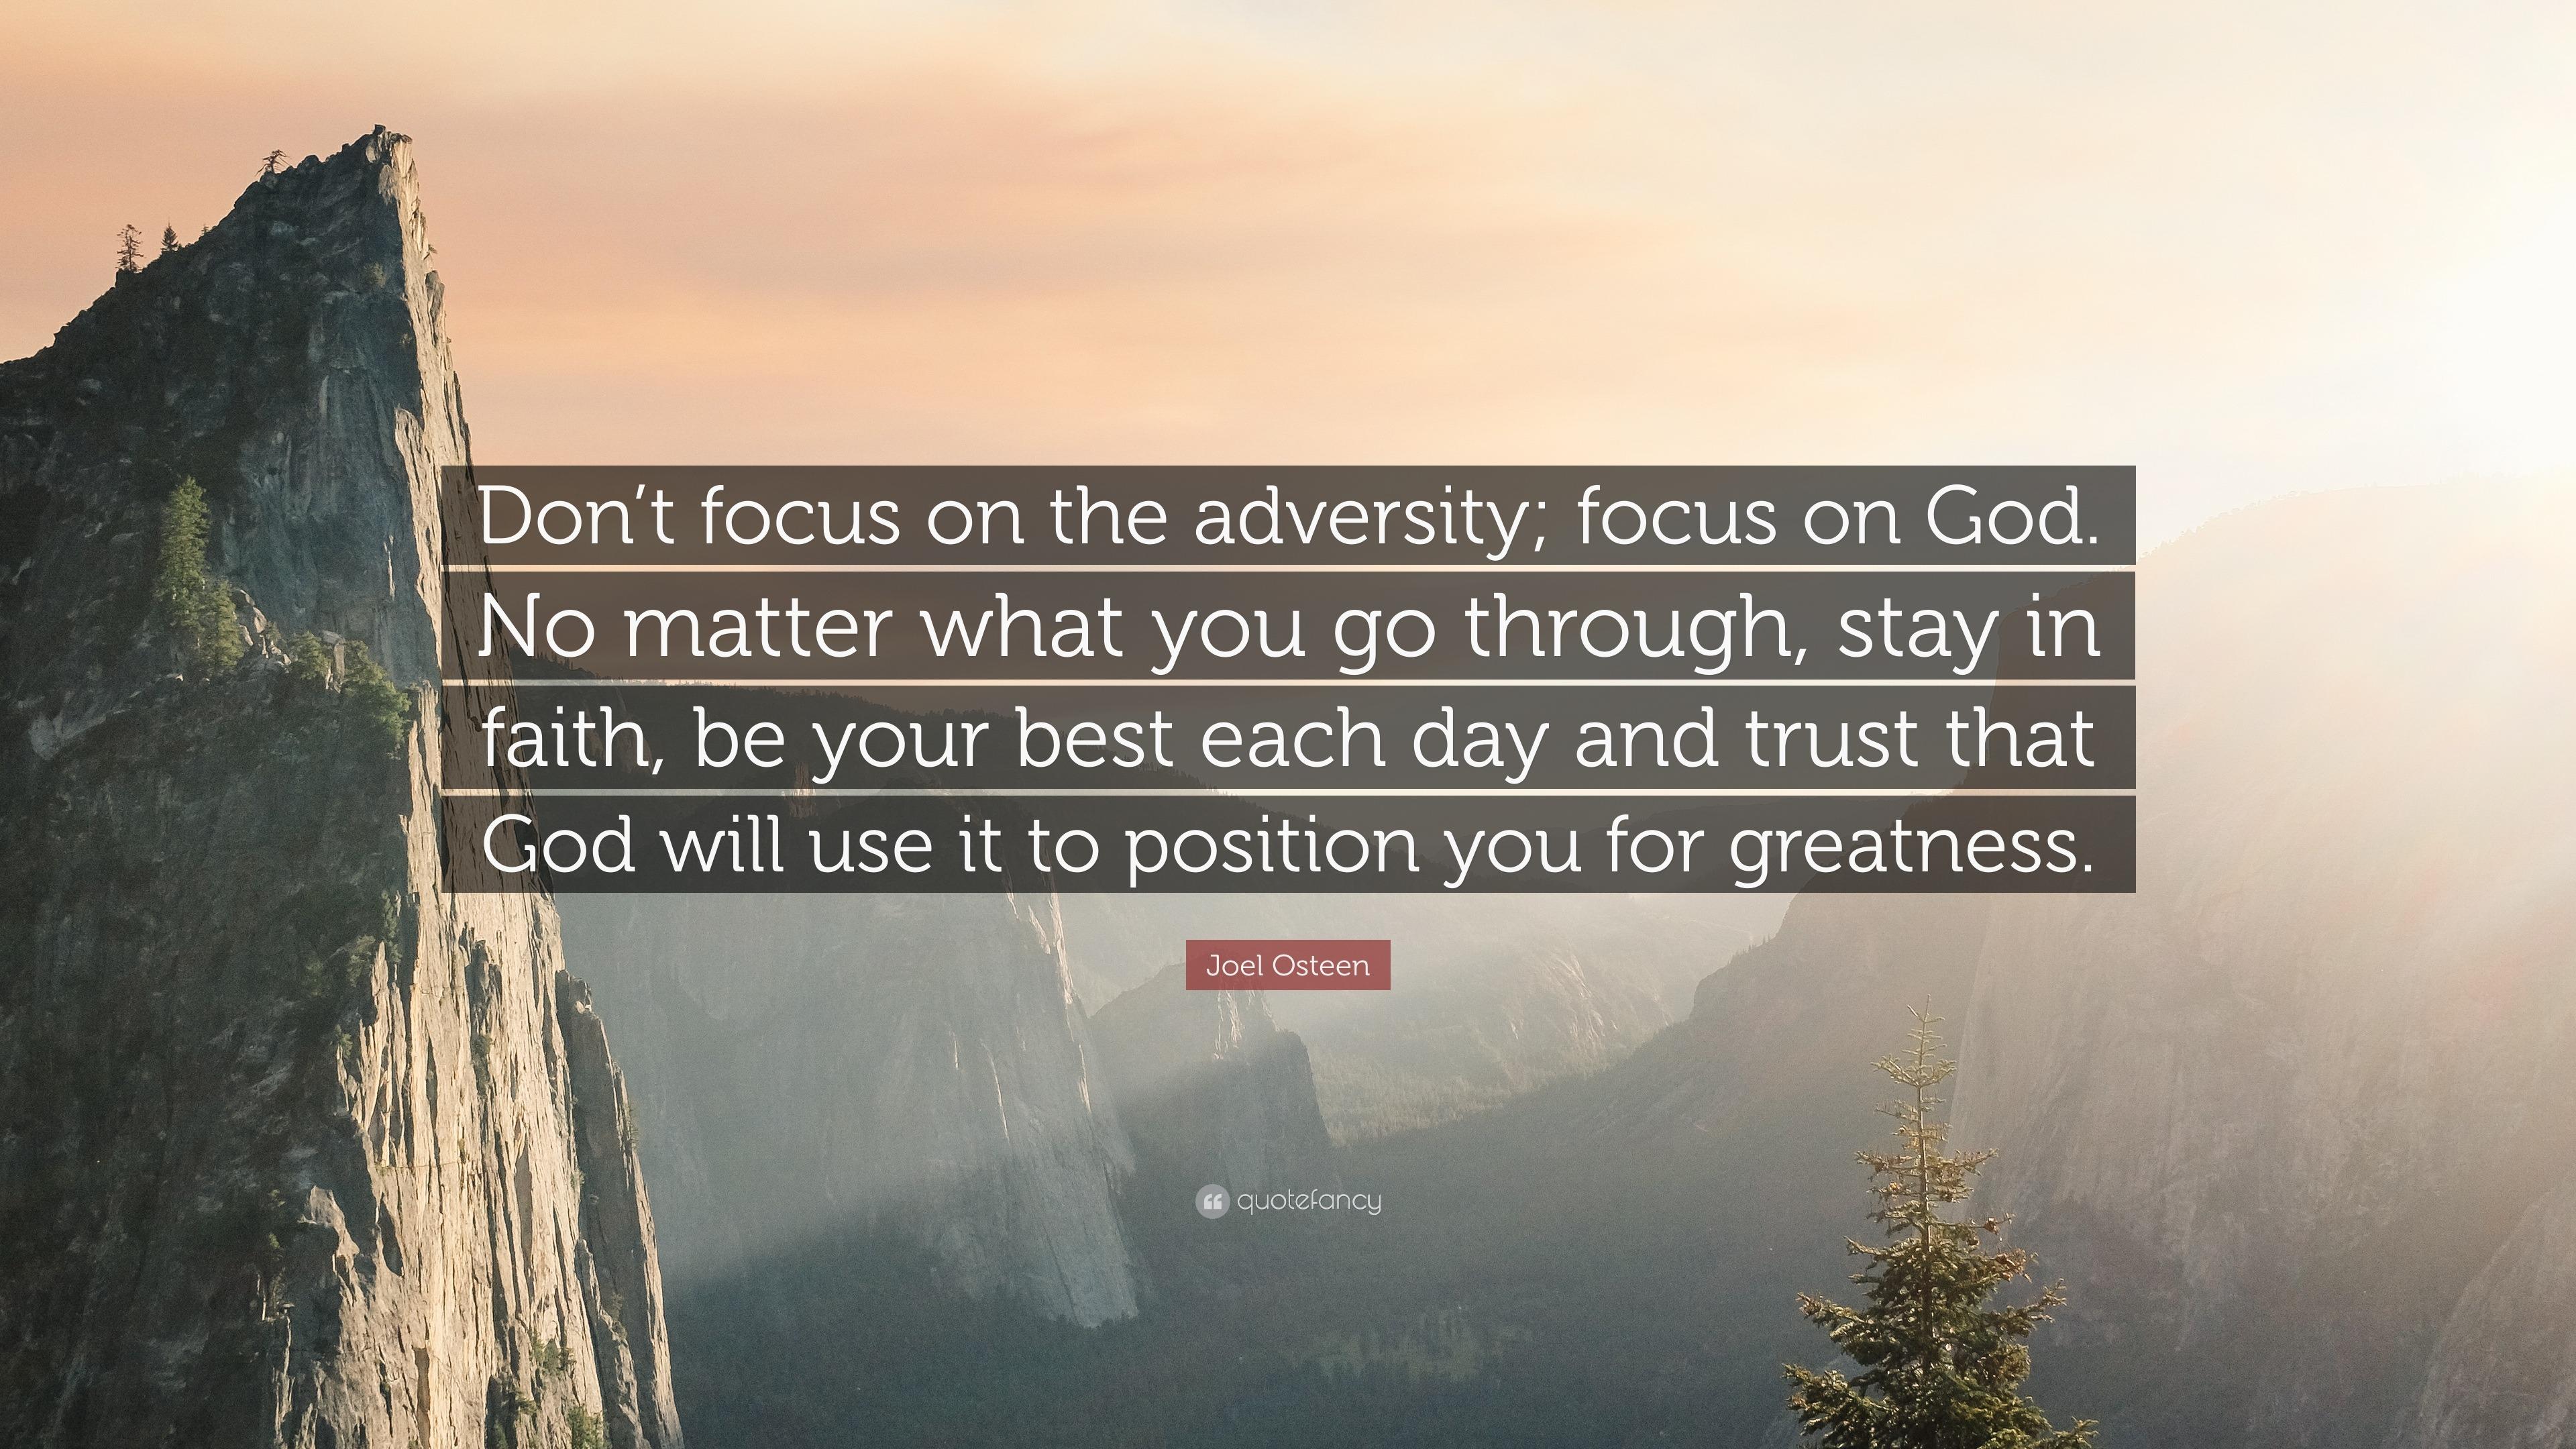 Joel Osteen Quote: U201cDonu0027t Focus On The Adversity; Focus On God